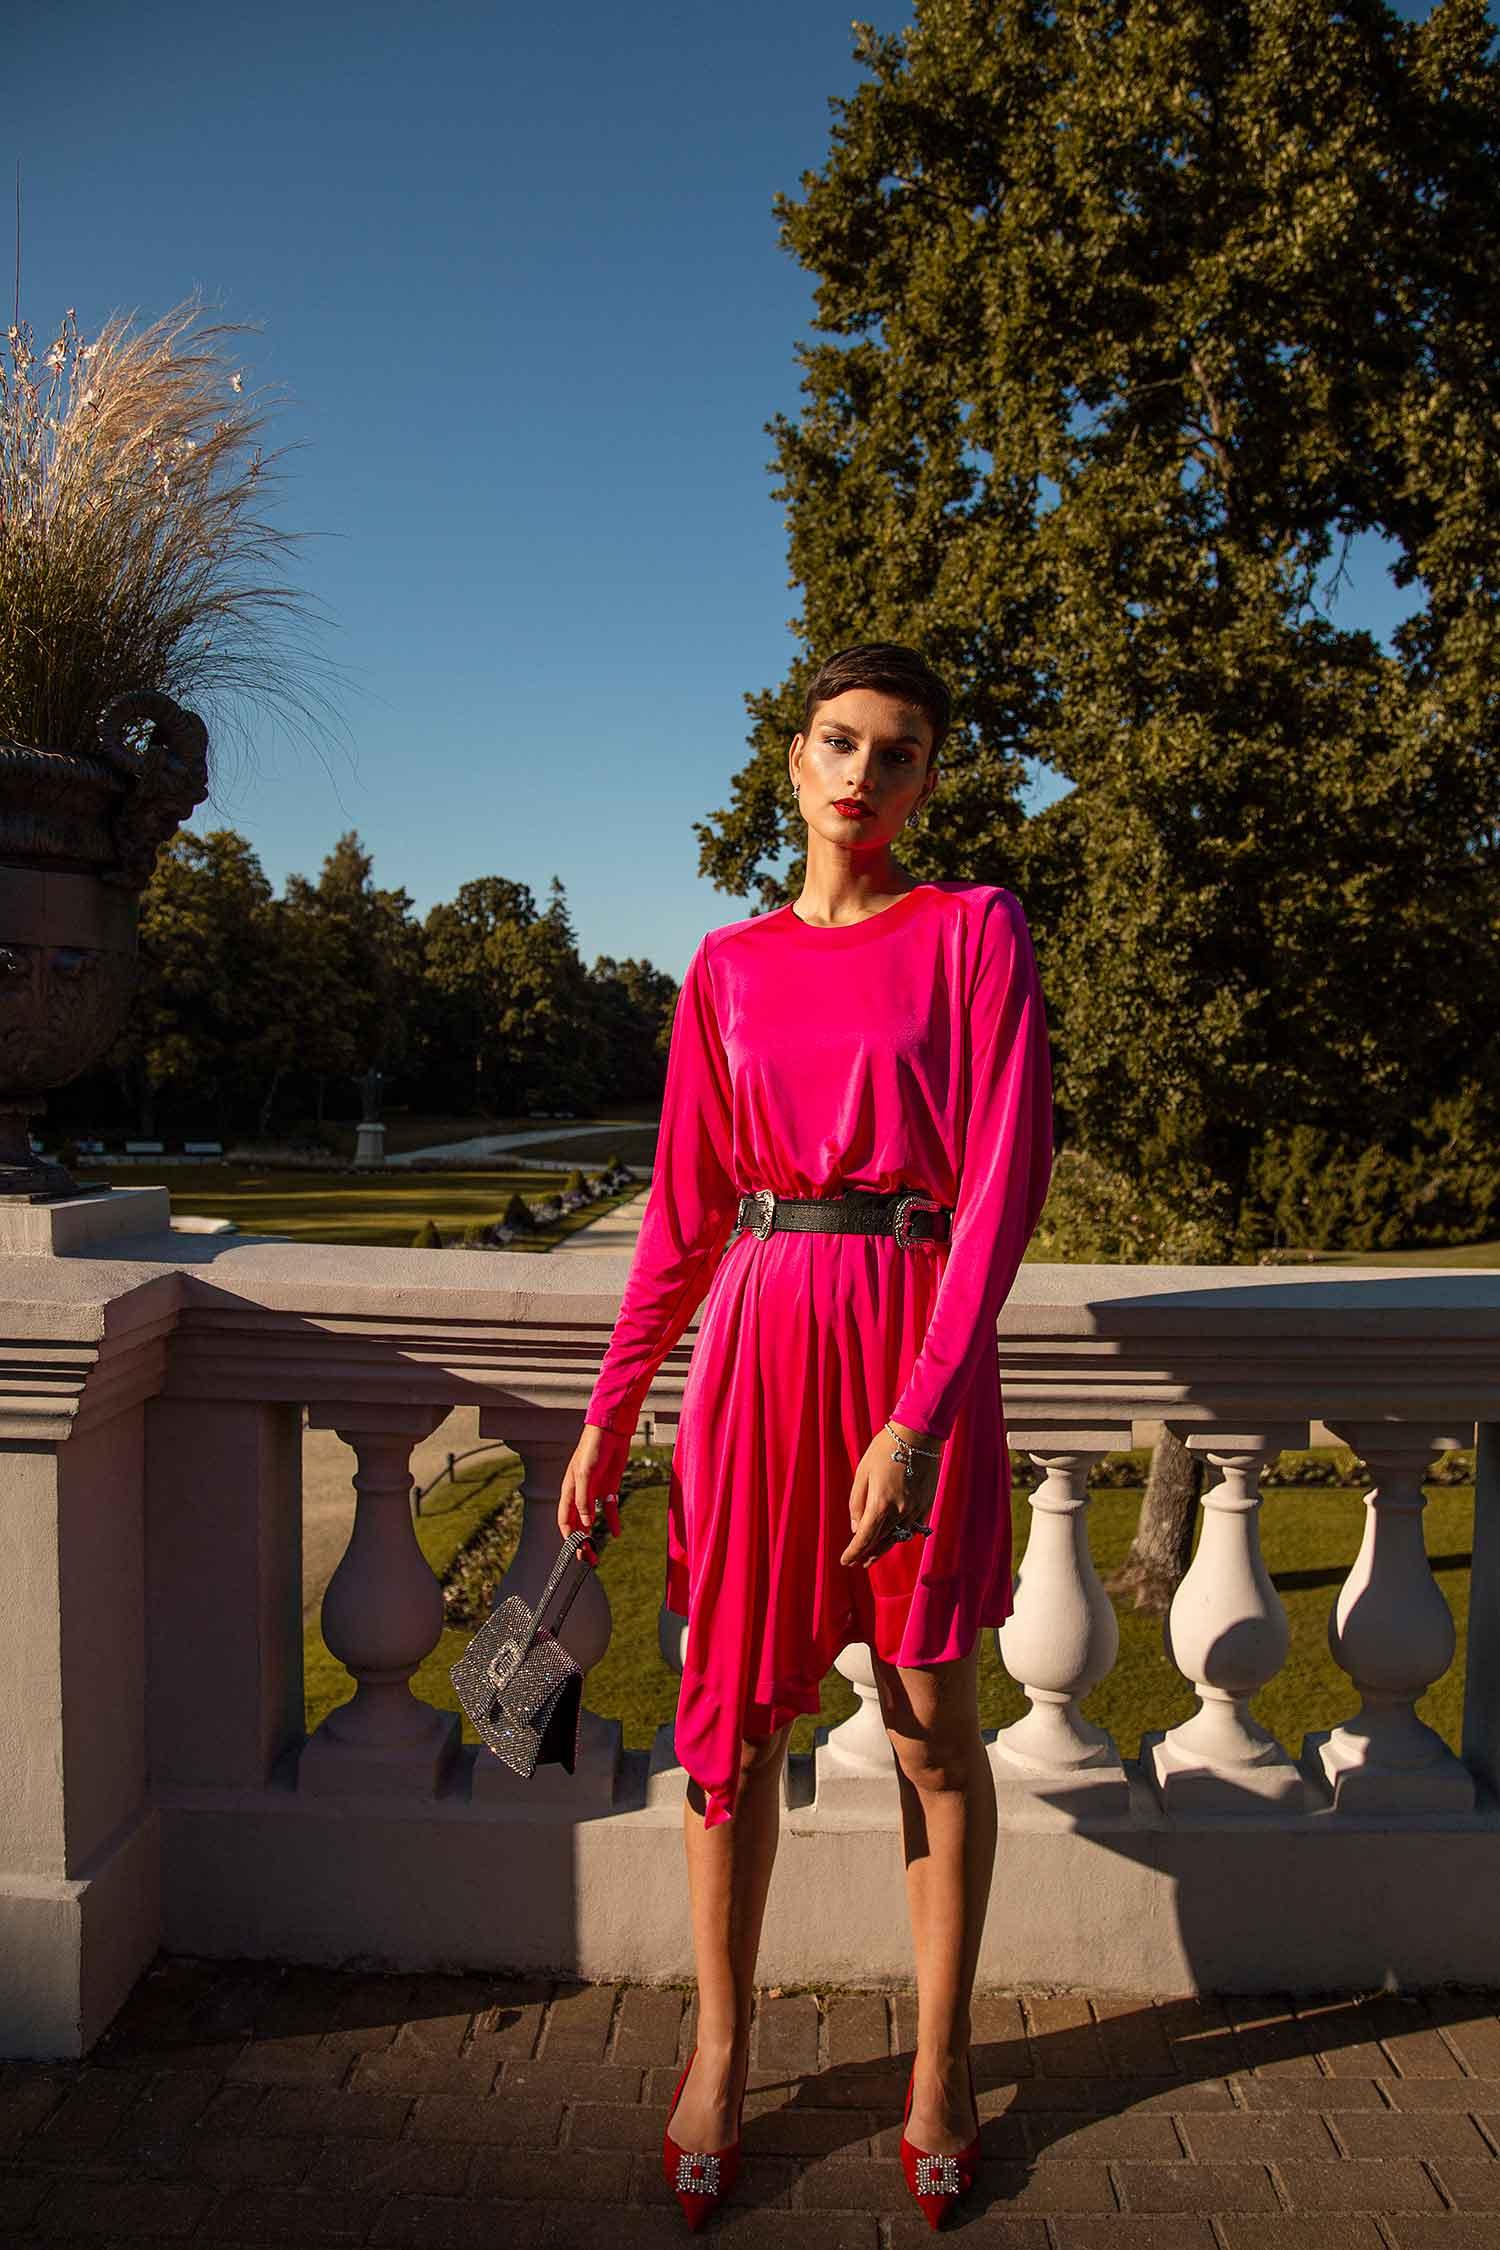 Model in pink vintage dress outdoors wearing Zydrune Celestial jewellery.